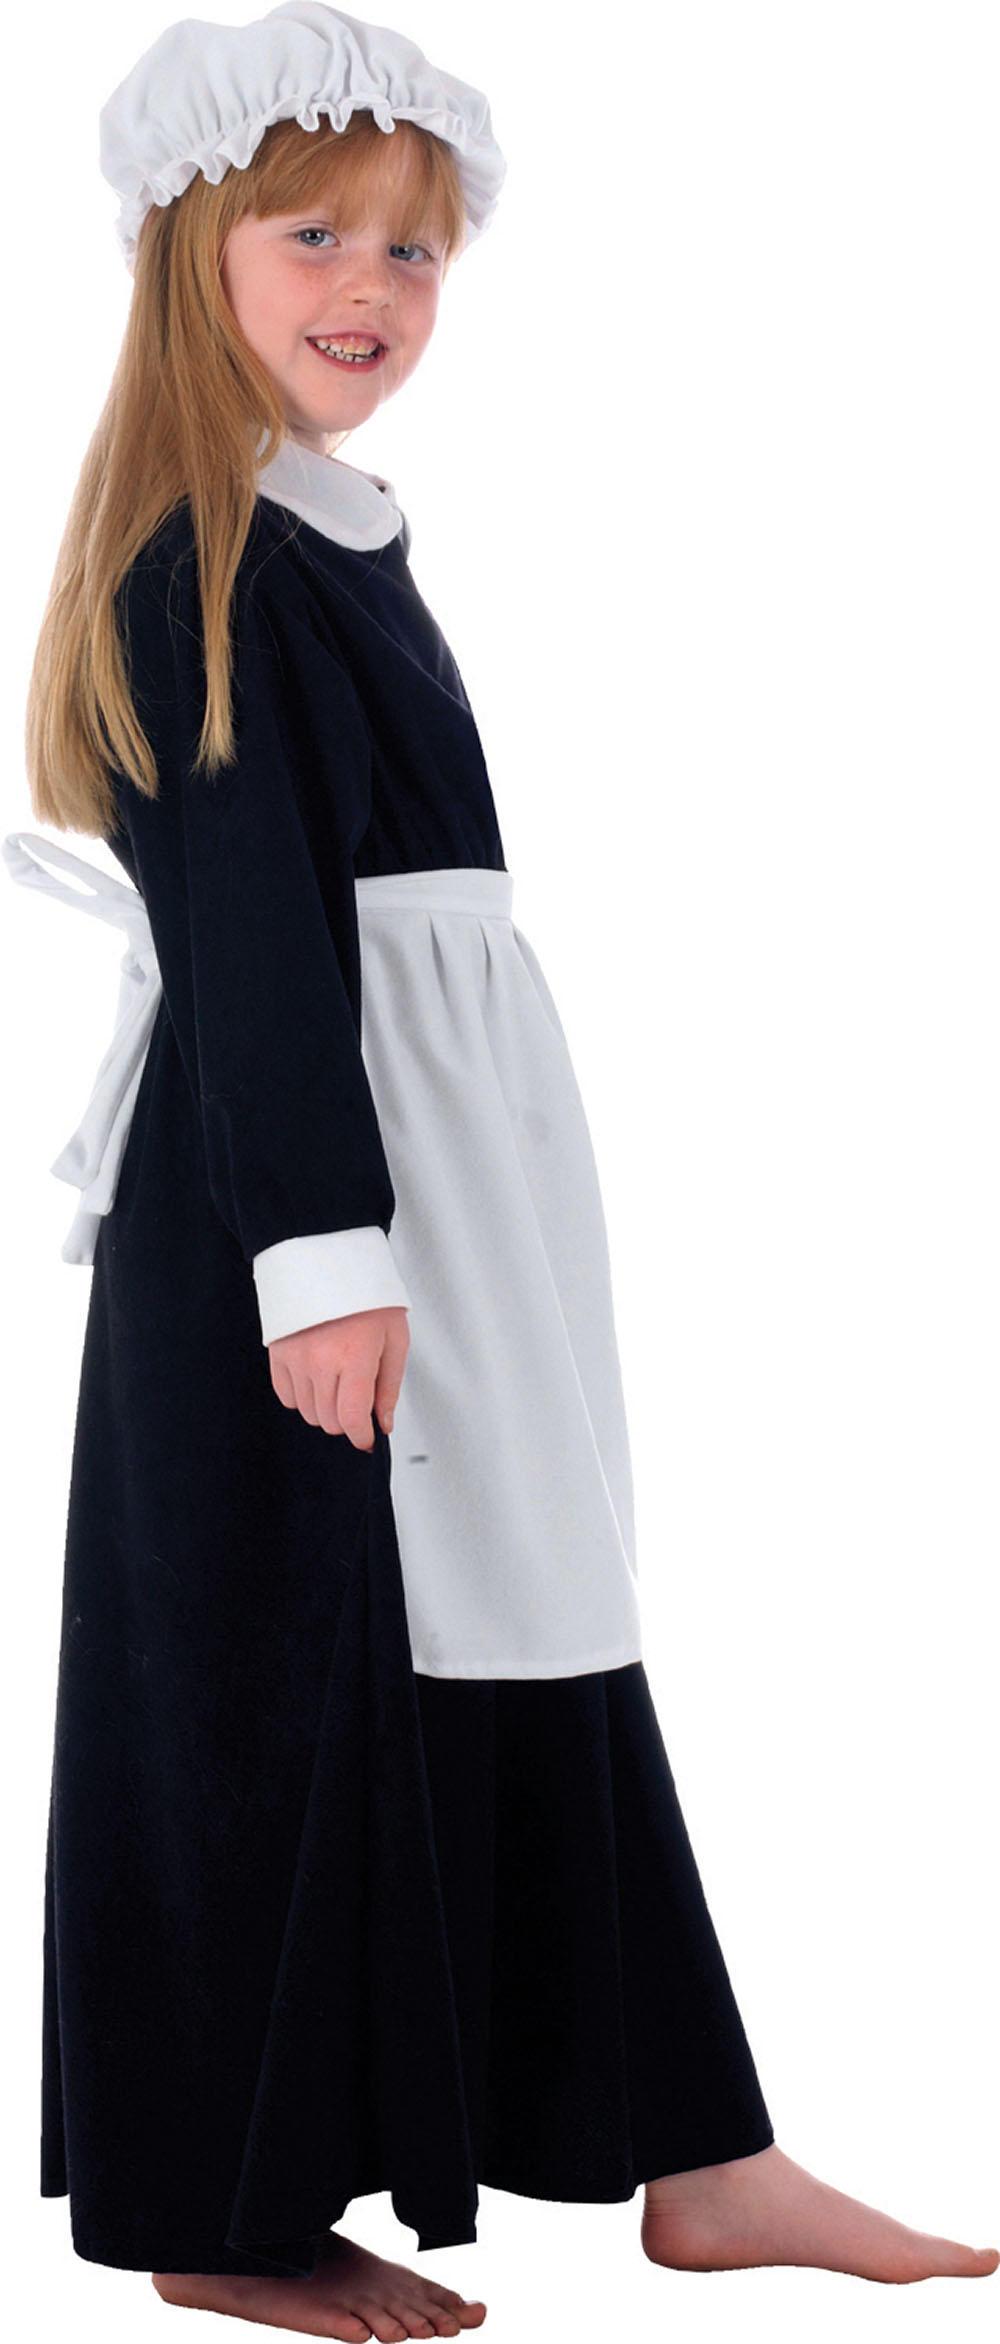 Girls Elsie The Parlour Maid Costume